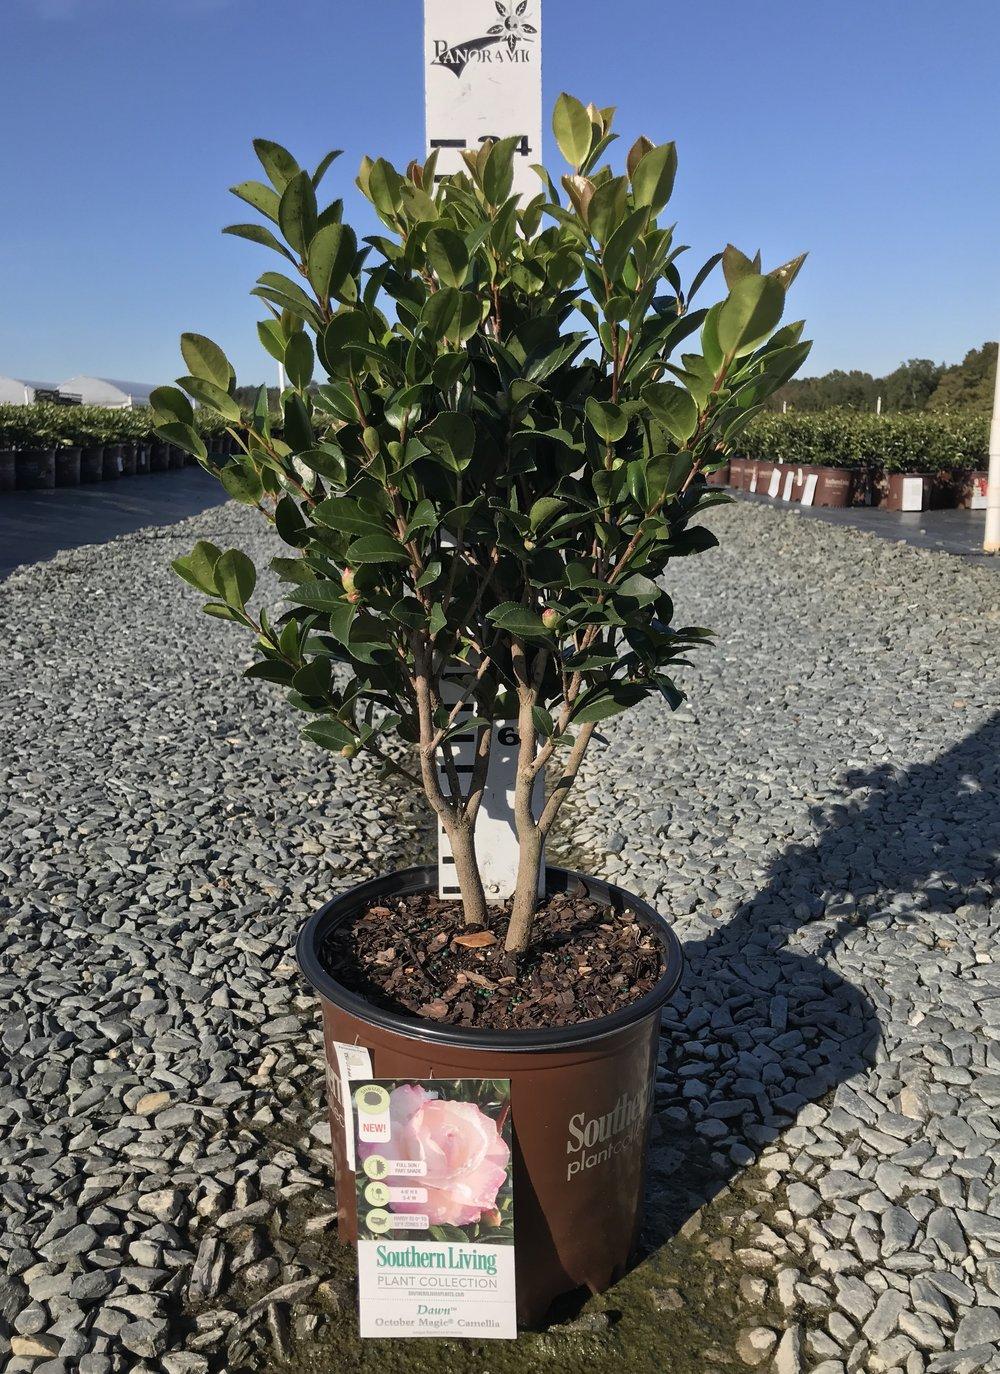 Camellia sasanqua, October Magic Dawn' 3g